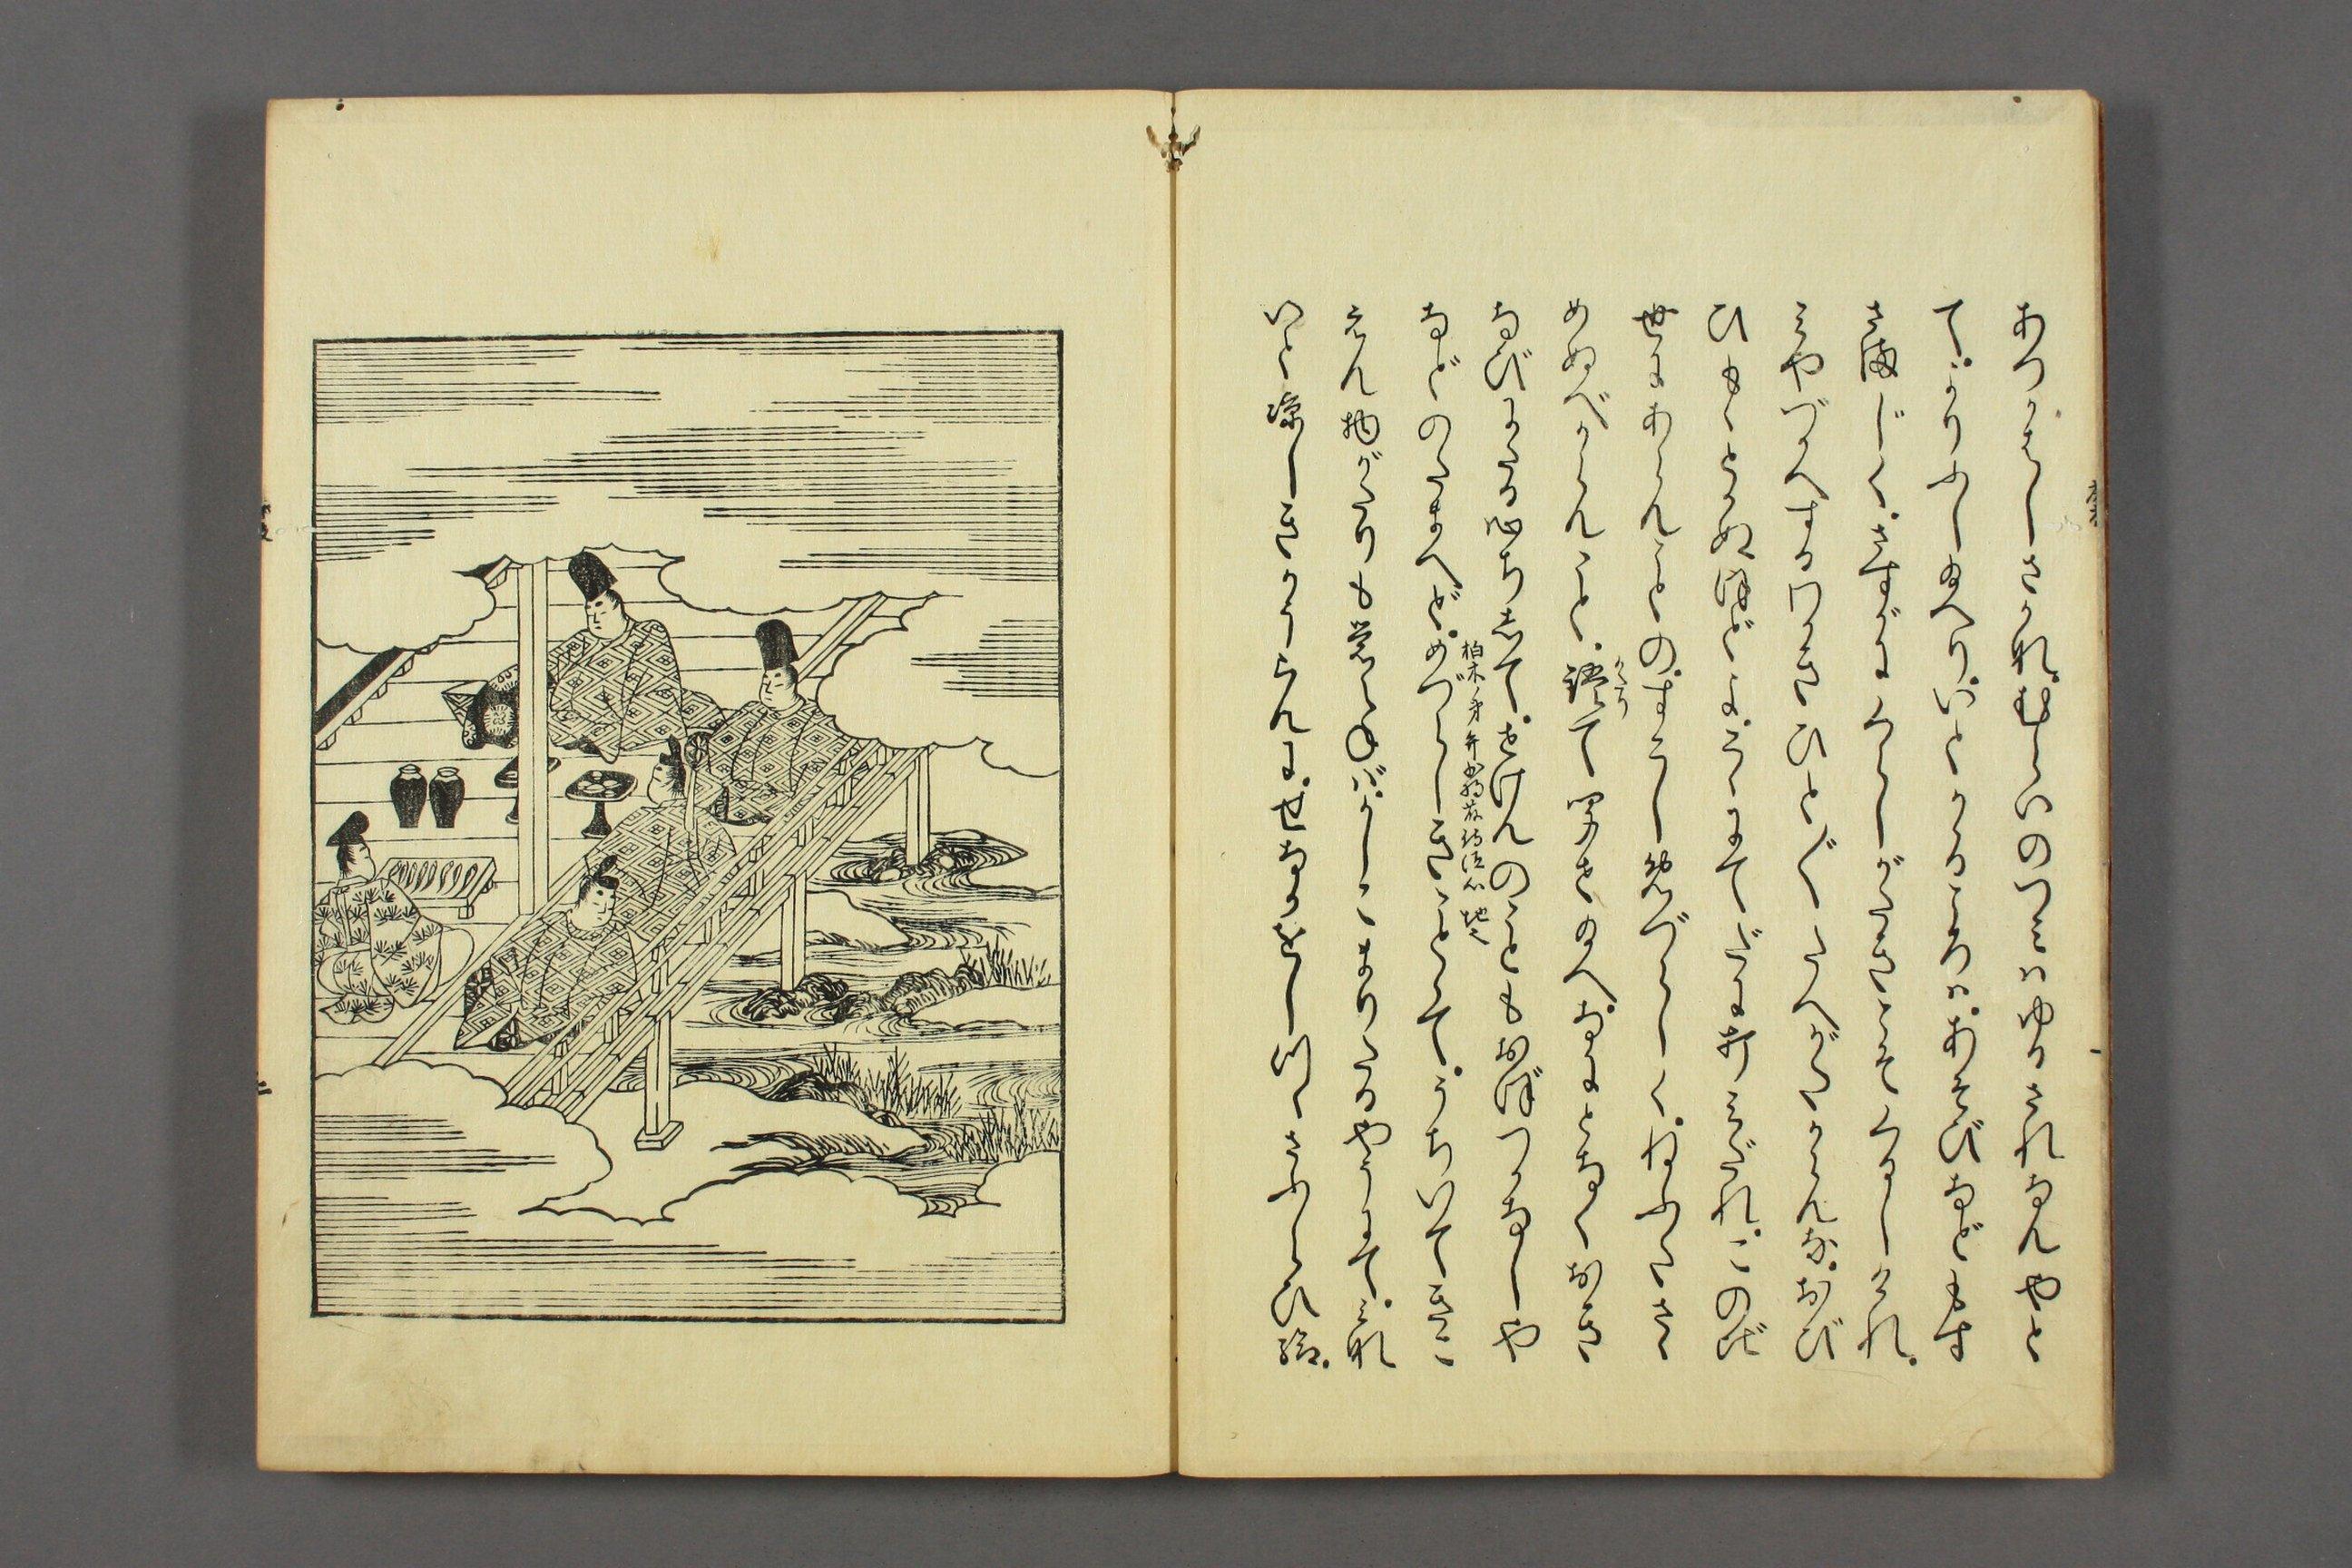 http://archive.wul.waseda.ac.jp/kosho/bunko30/bunko30_a0007/bunko30_a0007_0026/bunko30_a0007_0026_p0003.jpg